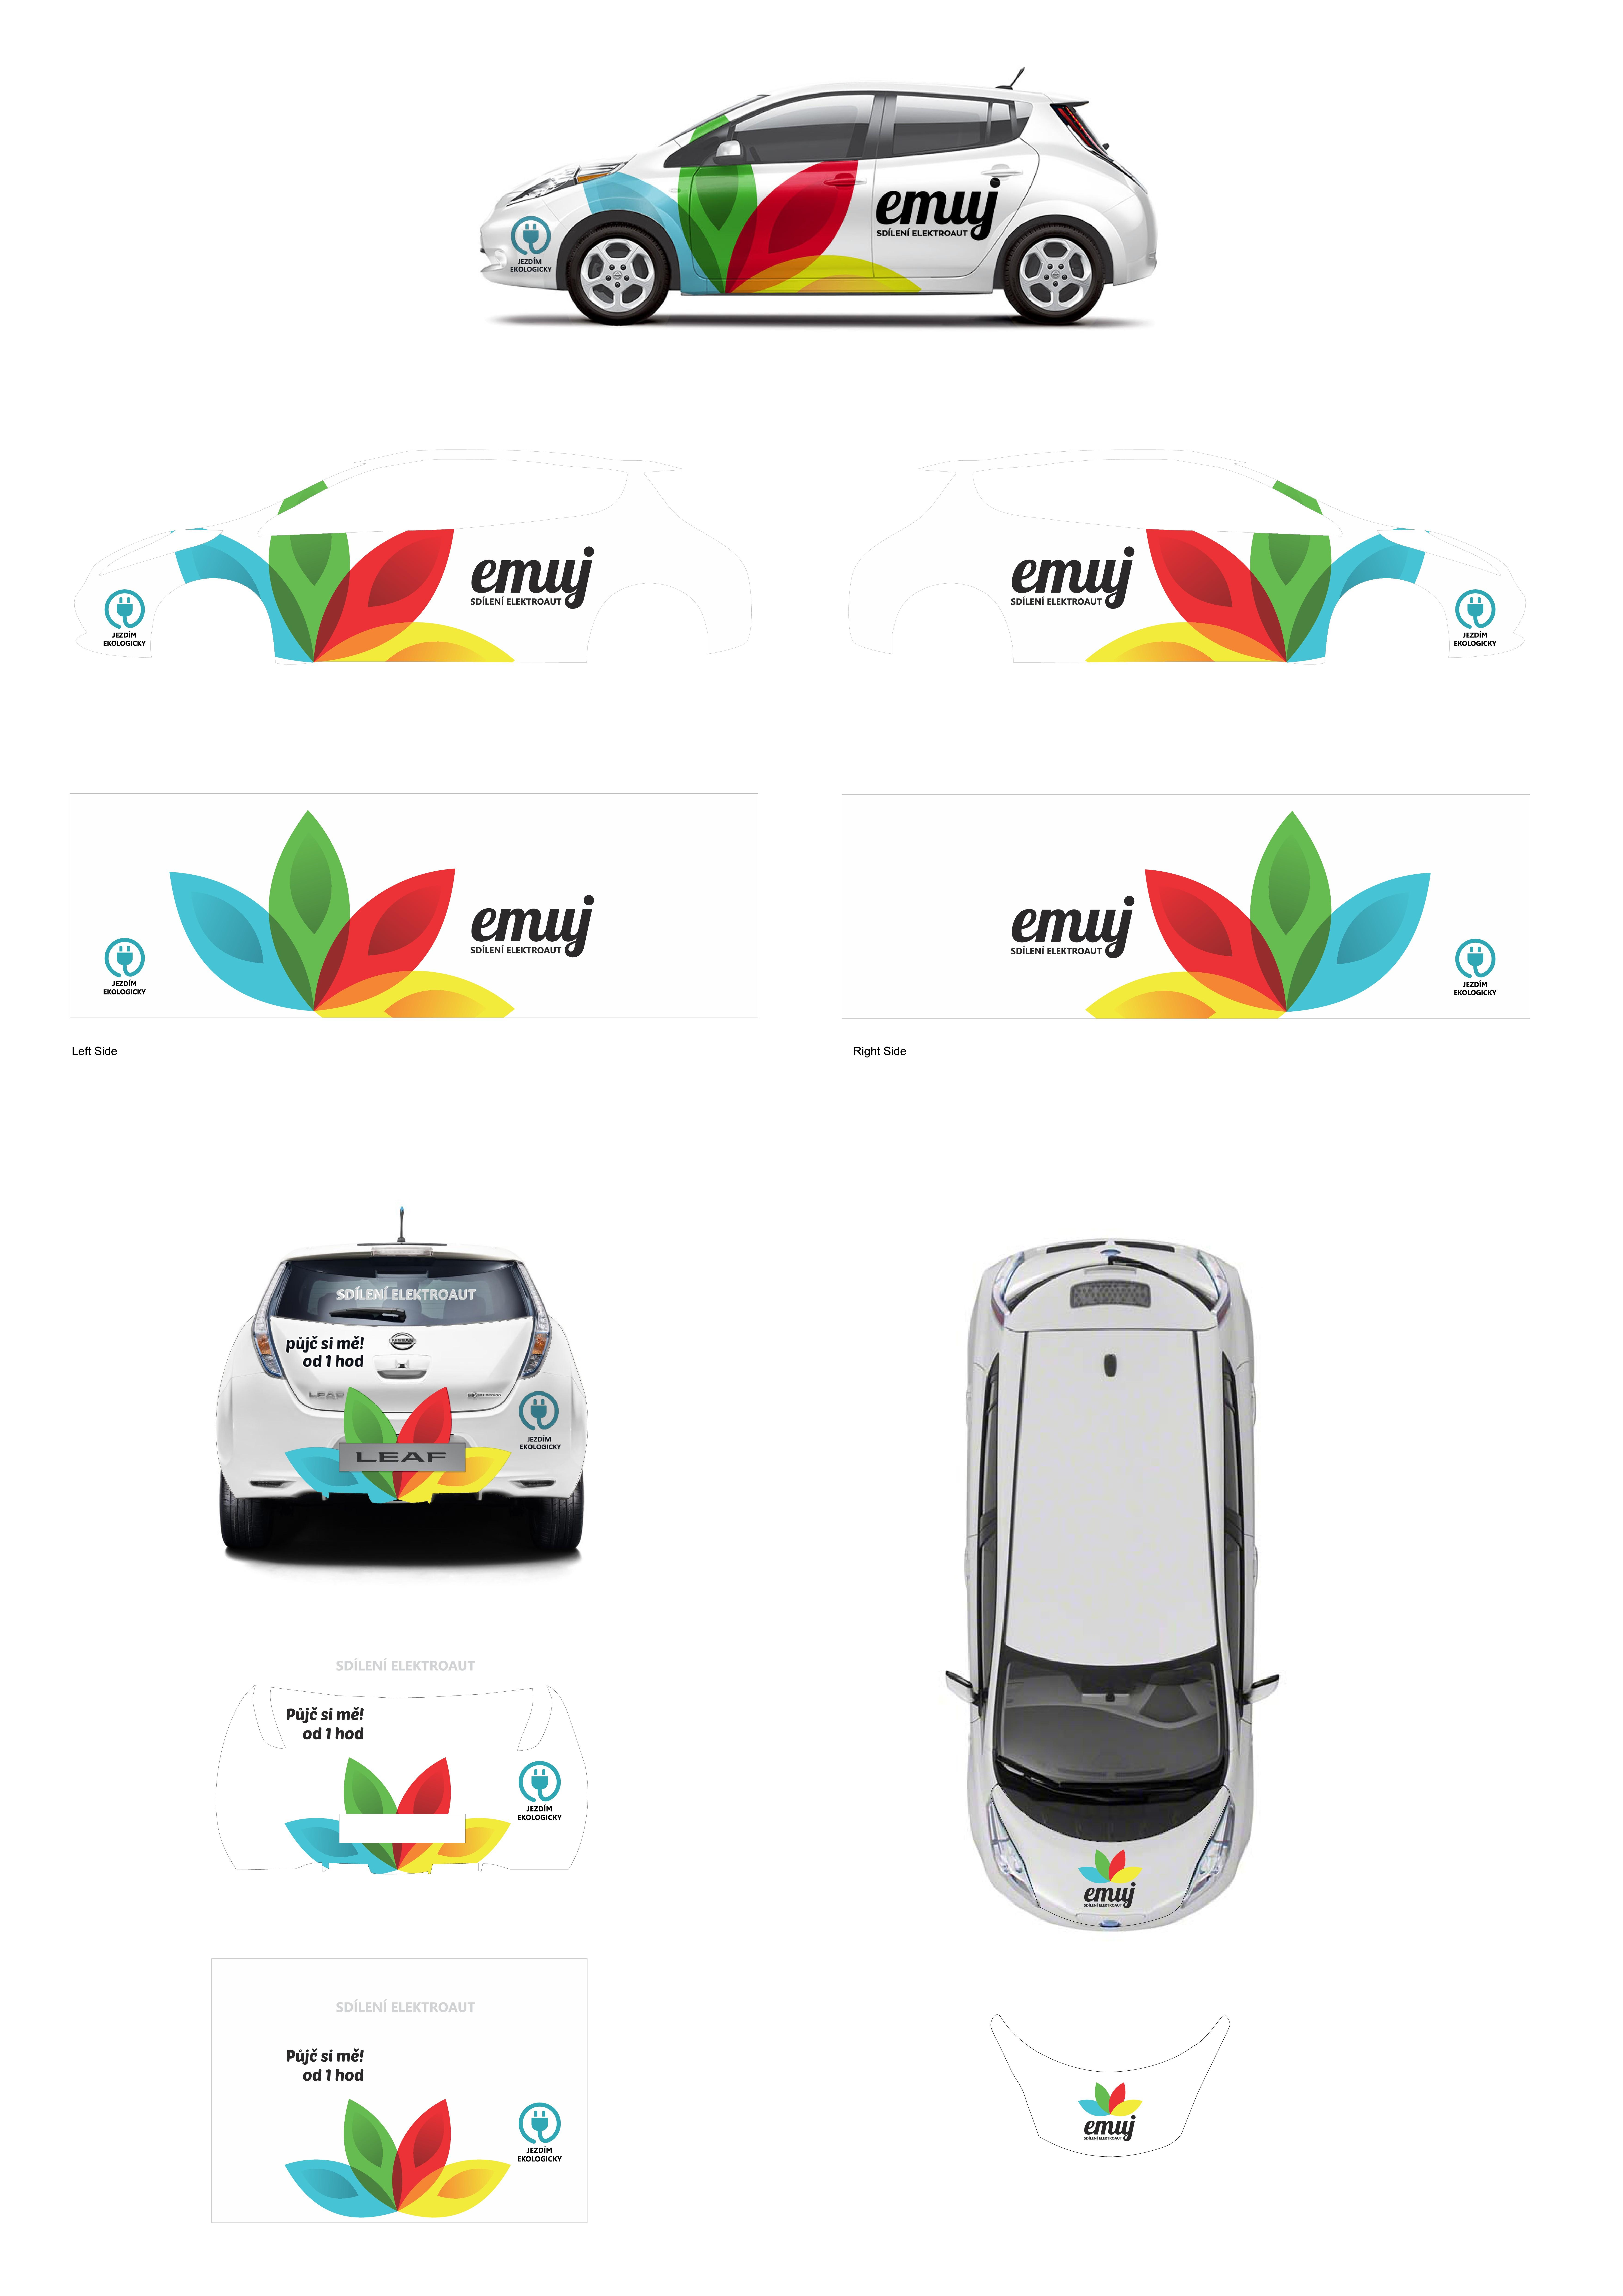 Create an eye catching car wrap for car-sharing organization.